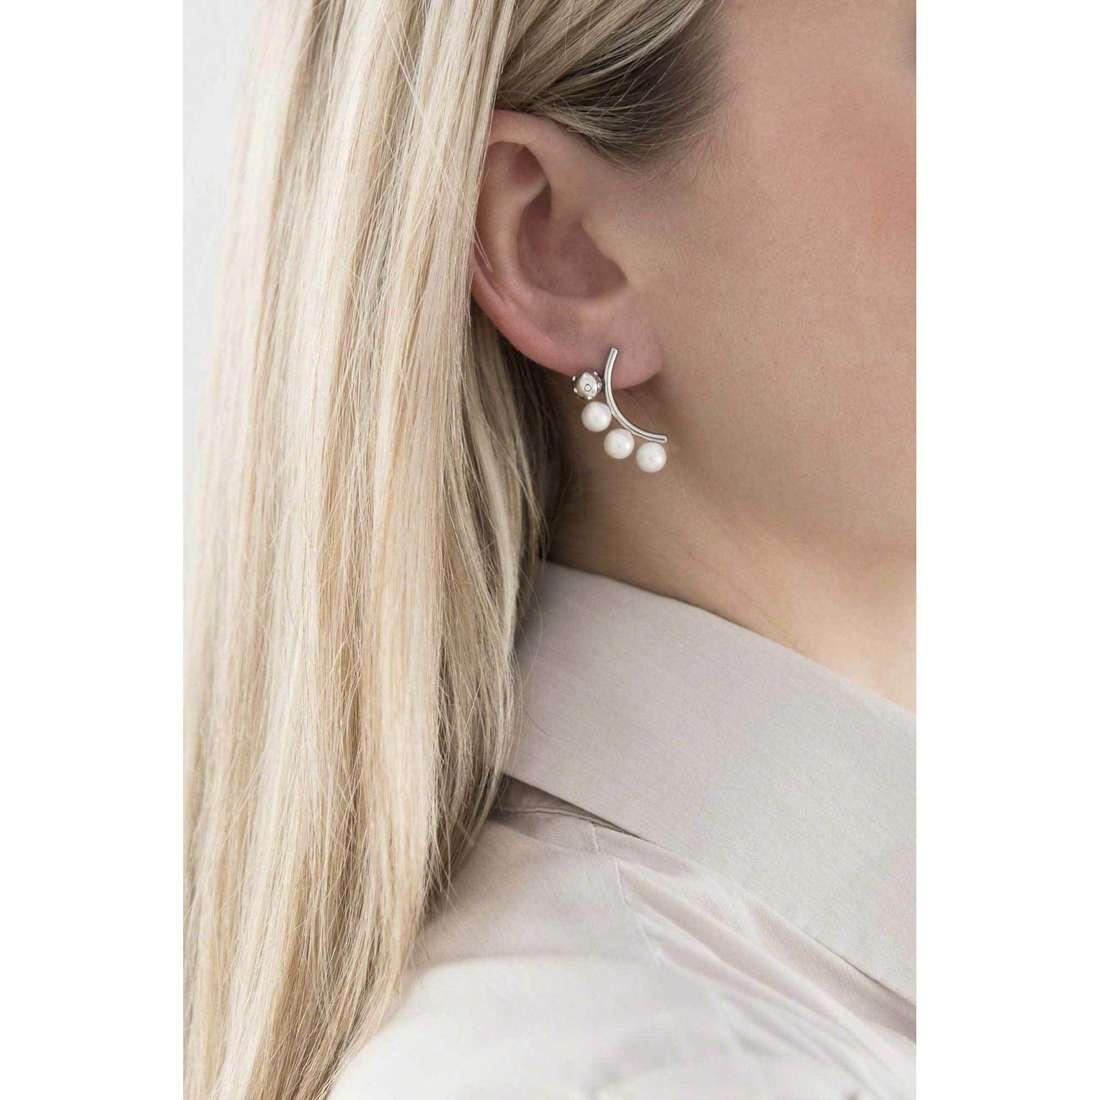 Morellato boucles d'oreille Lunae femme SADX09 indosso